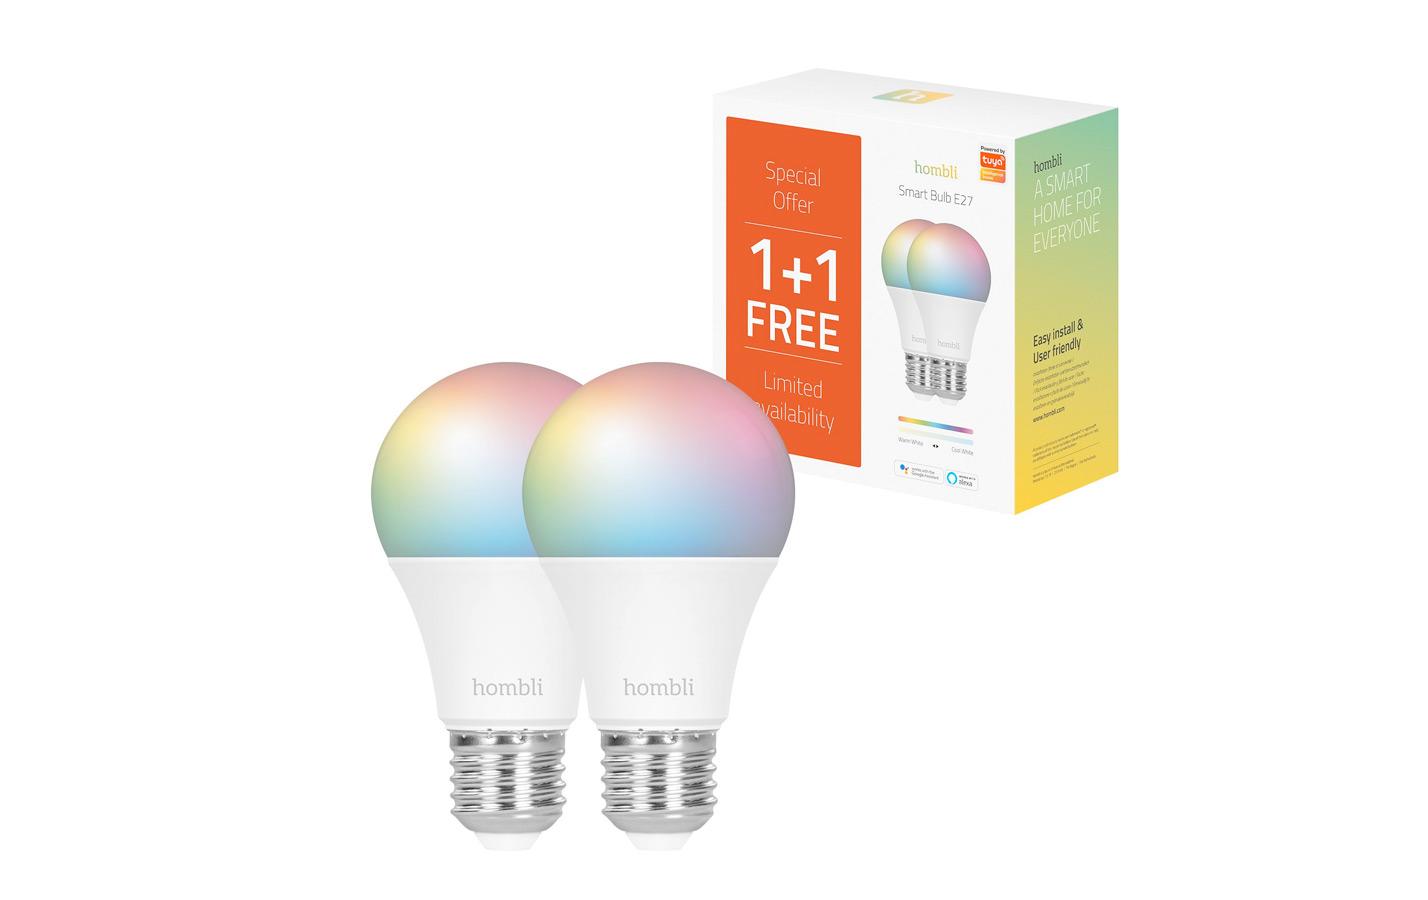 Hombli Slimme RGBW Lamp E27 WiFi 1 + 1 gratis